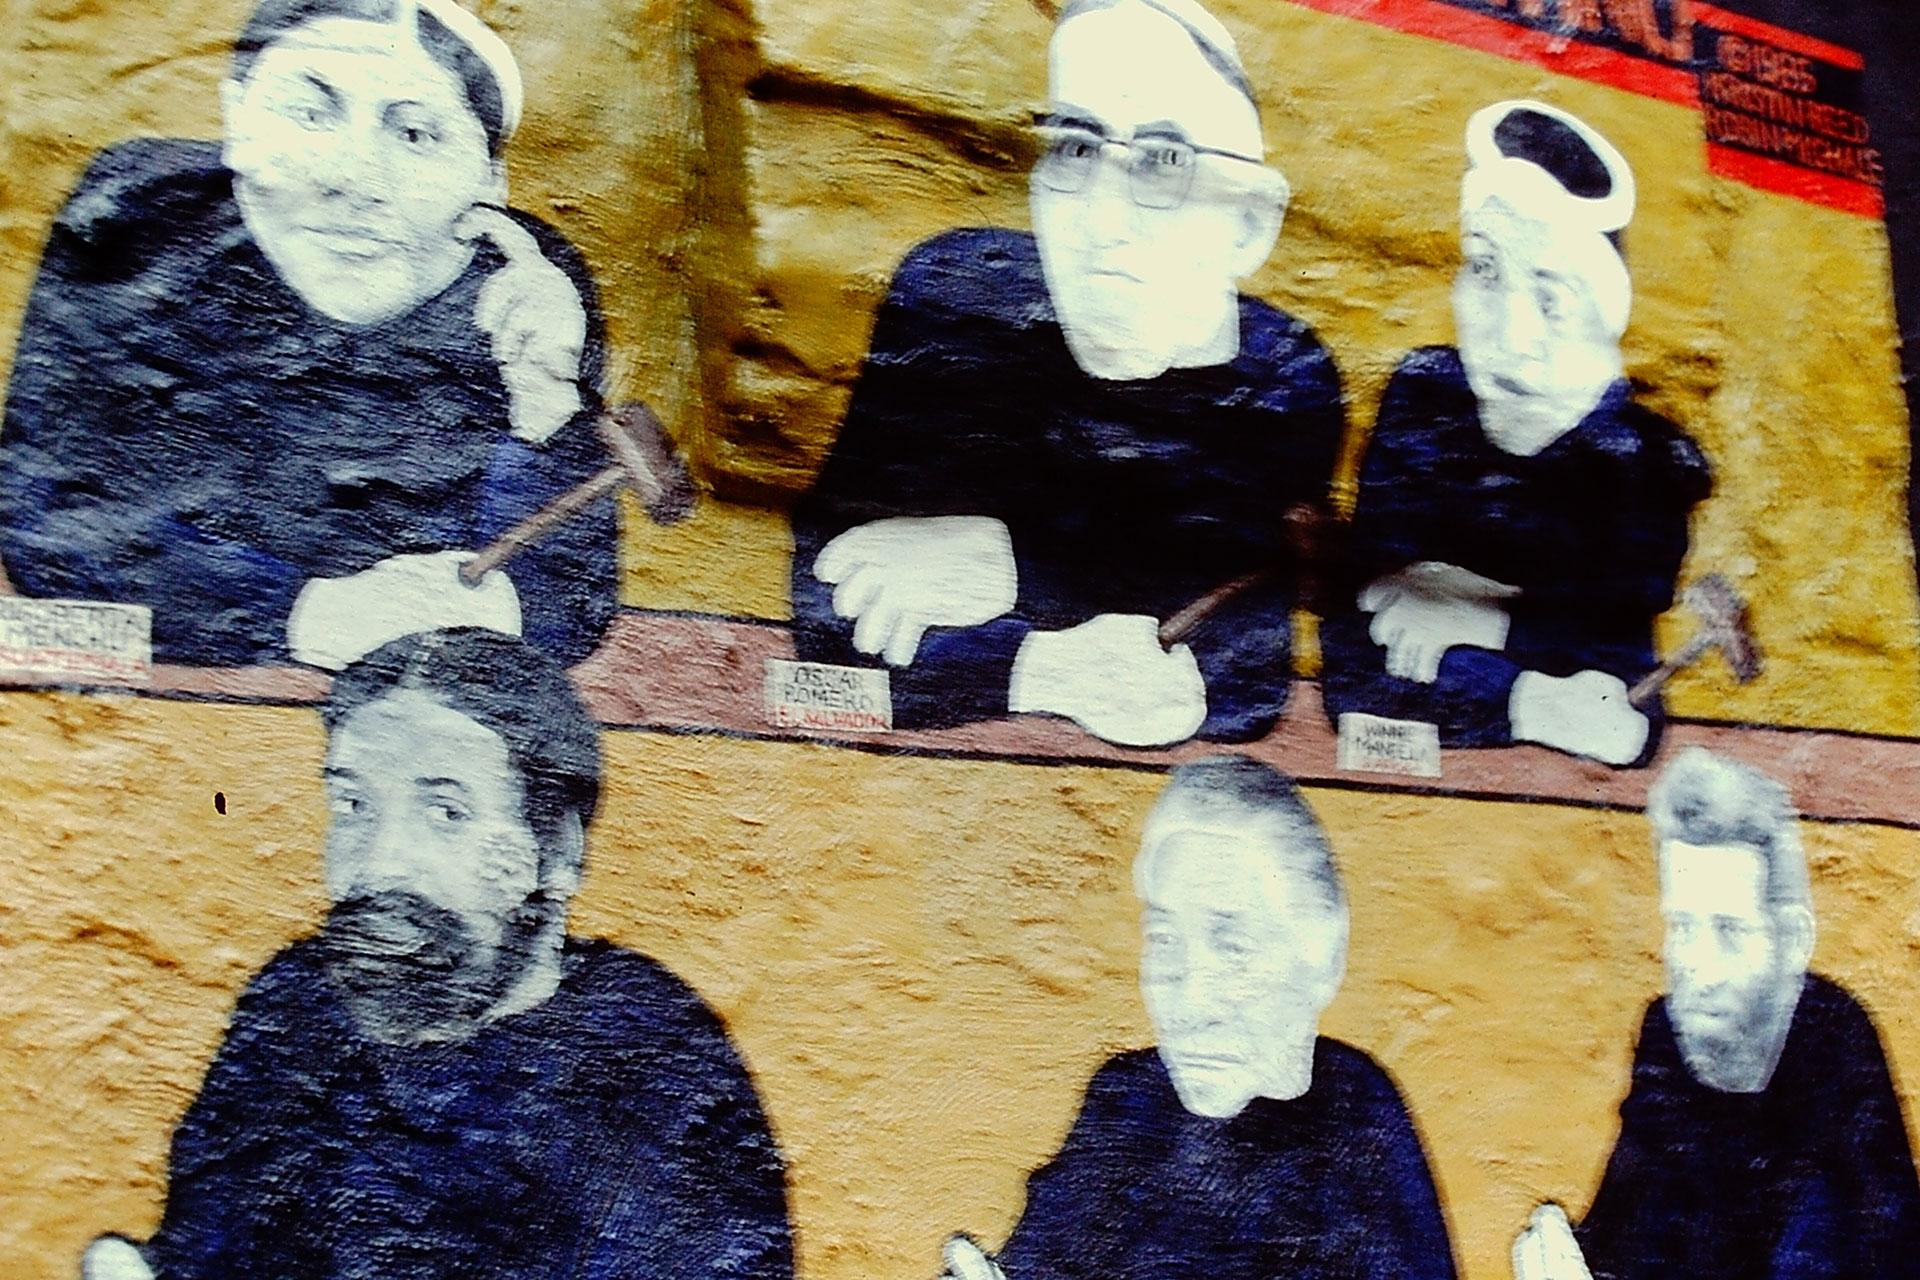 Robin Michals' jurors.  Top from left: Rigoberta Menchú, Oscar Romero, Winnie Mandela Bottom from left: Victor, Augustine, Ralph  Photo © Camille Perrottet